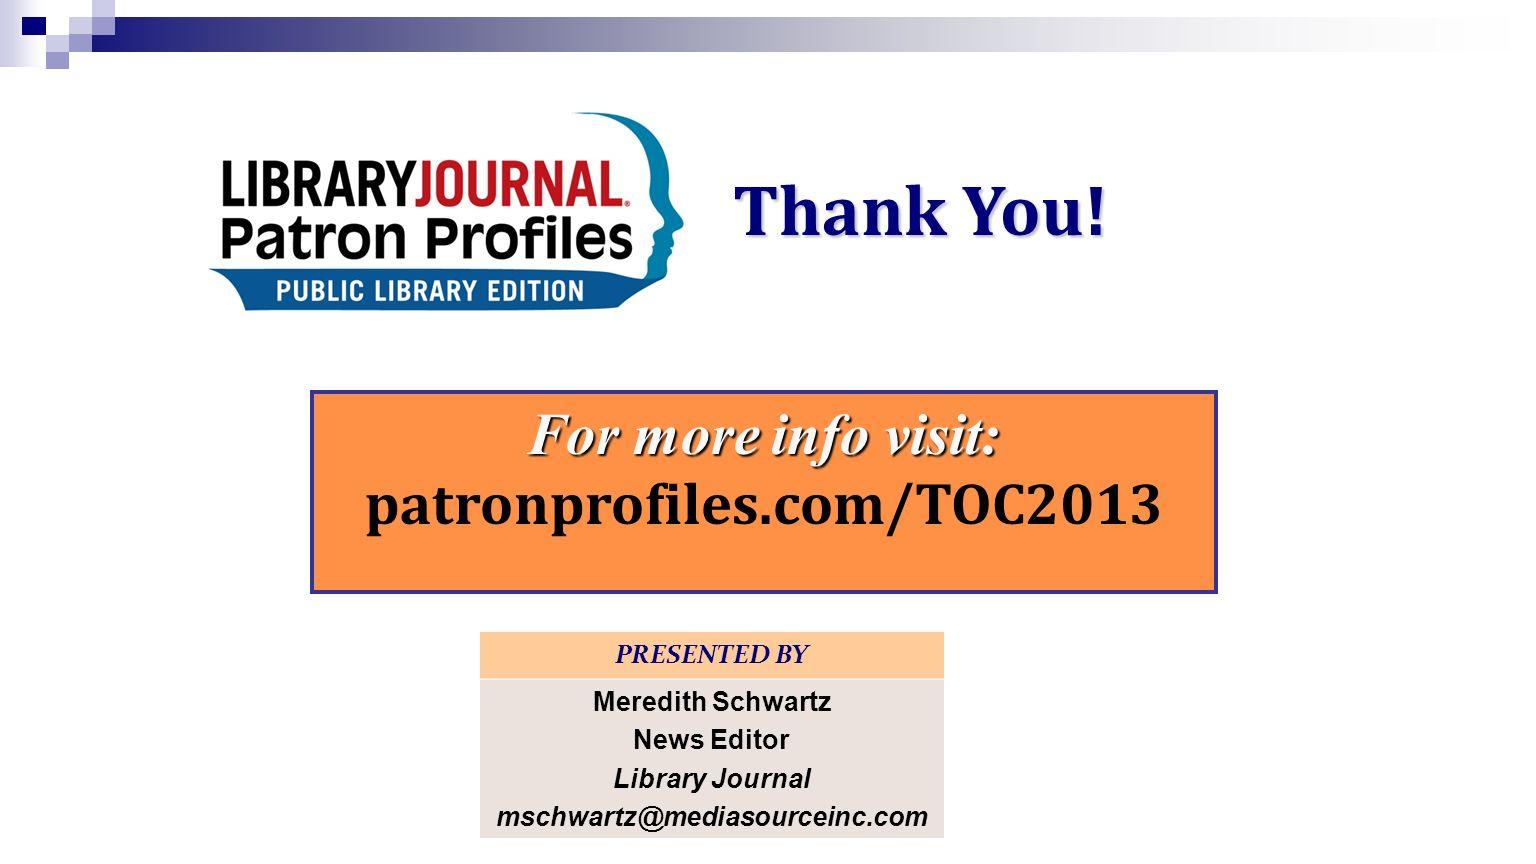 Thank You! PRESENTED BY Meredith Schwartz News Editor Library Journal mschwartz@mediasourceinc.com For more info visit: patronprofiles.com/TOC2013